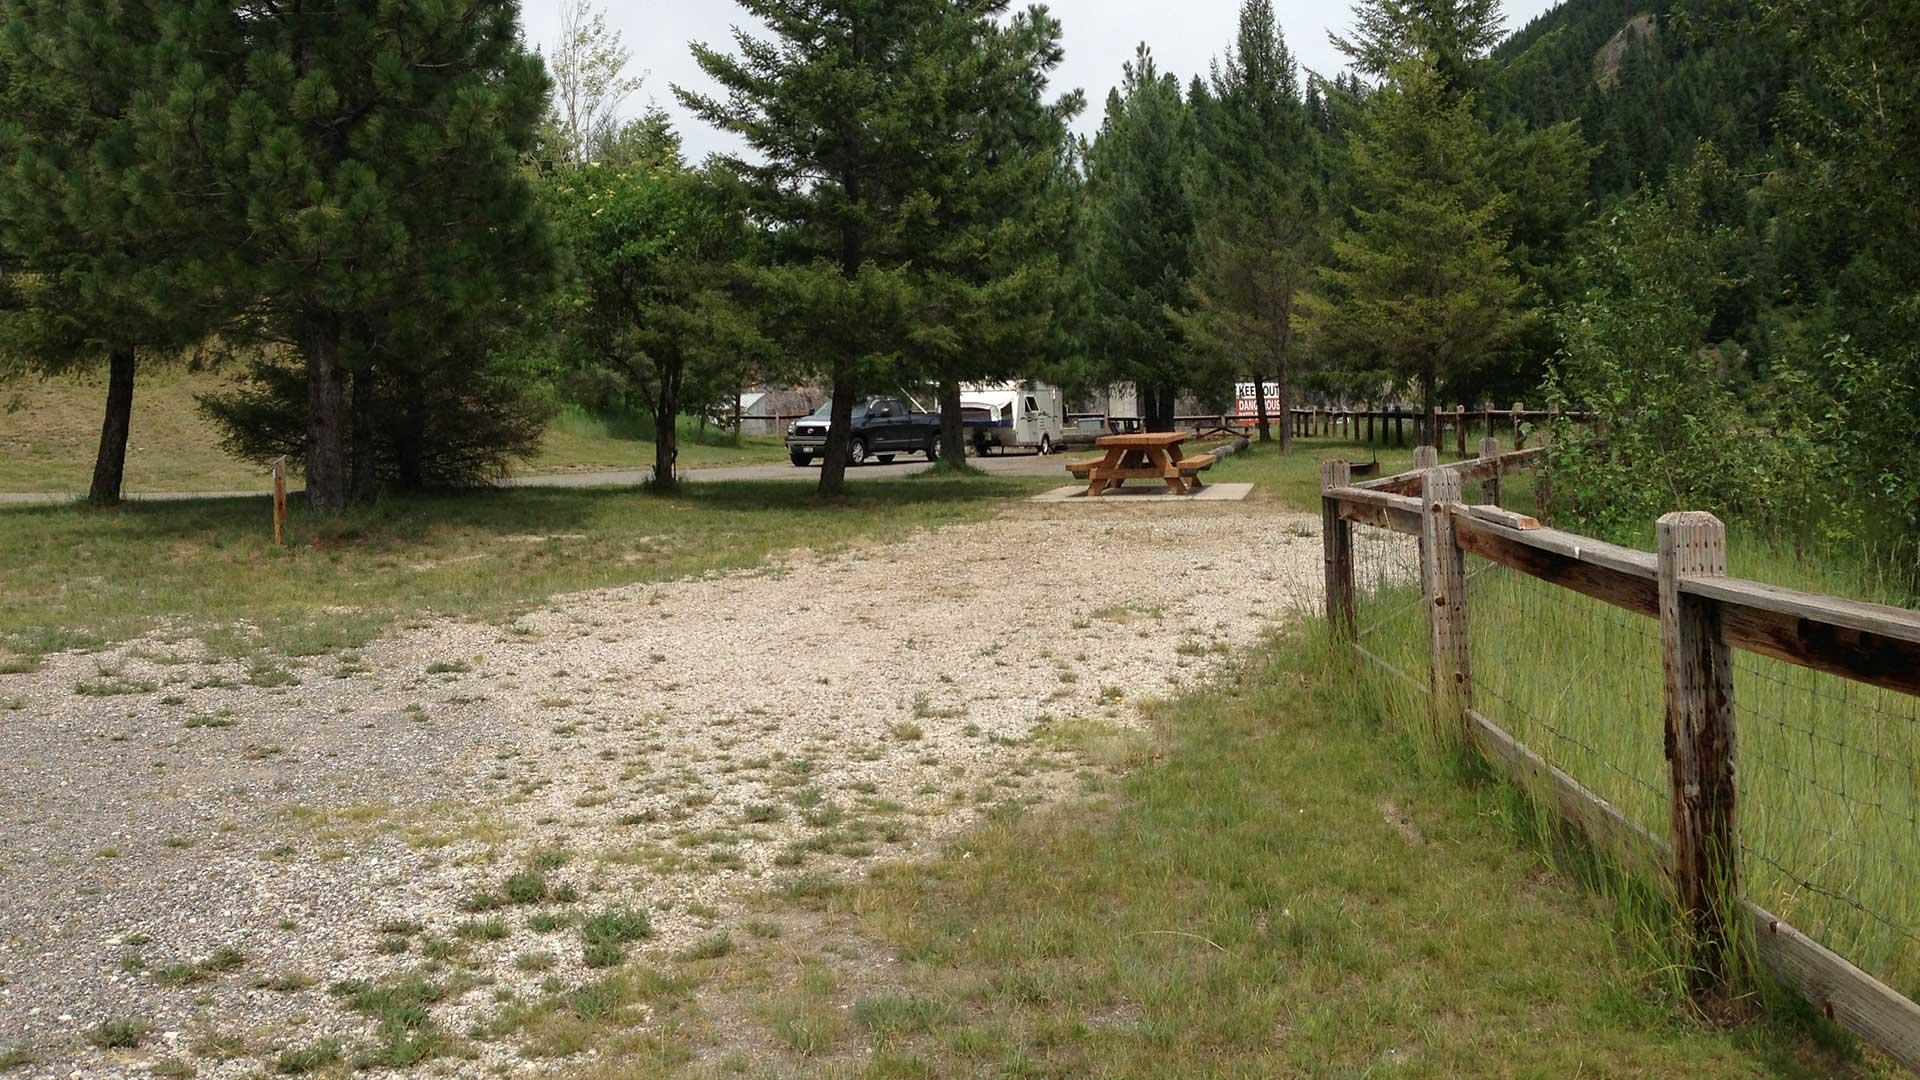 Forebay Recreation Area - existing condition, campsite